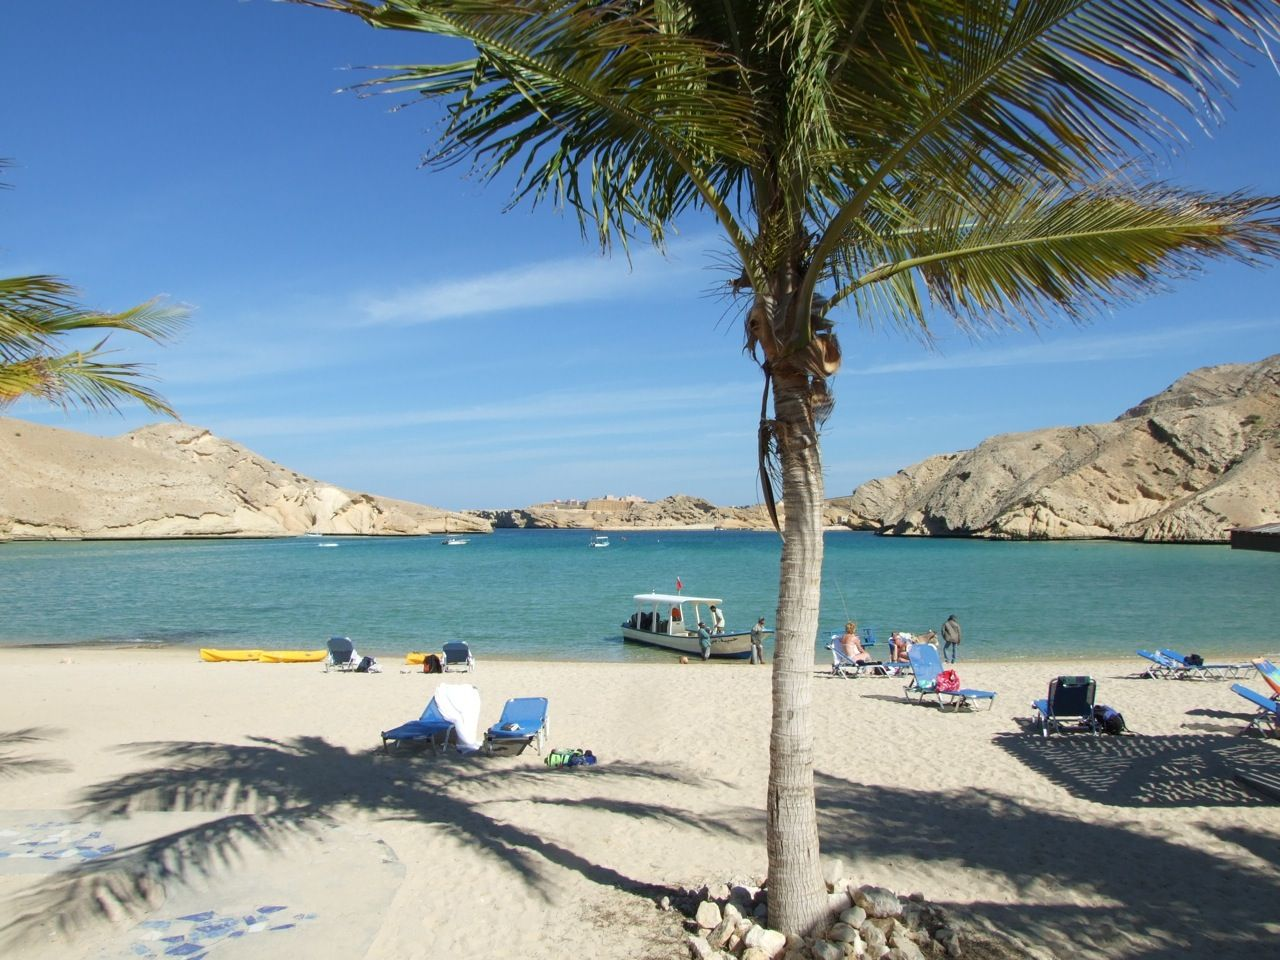 Oman Dive Center Muscat View On Fb Https Www Facebook Com Omanpocketguide Credit Pierre Haut Oman Italy Travel Travel